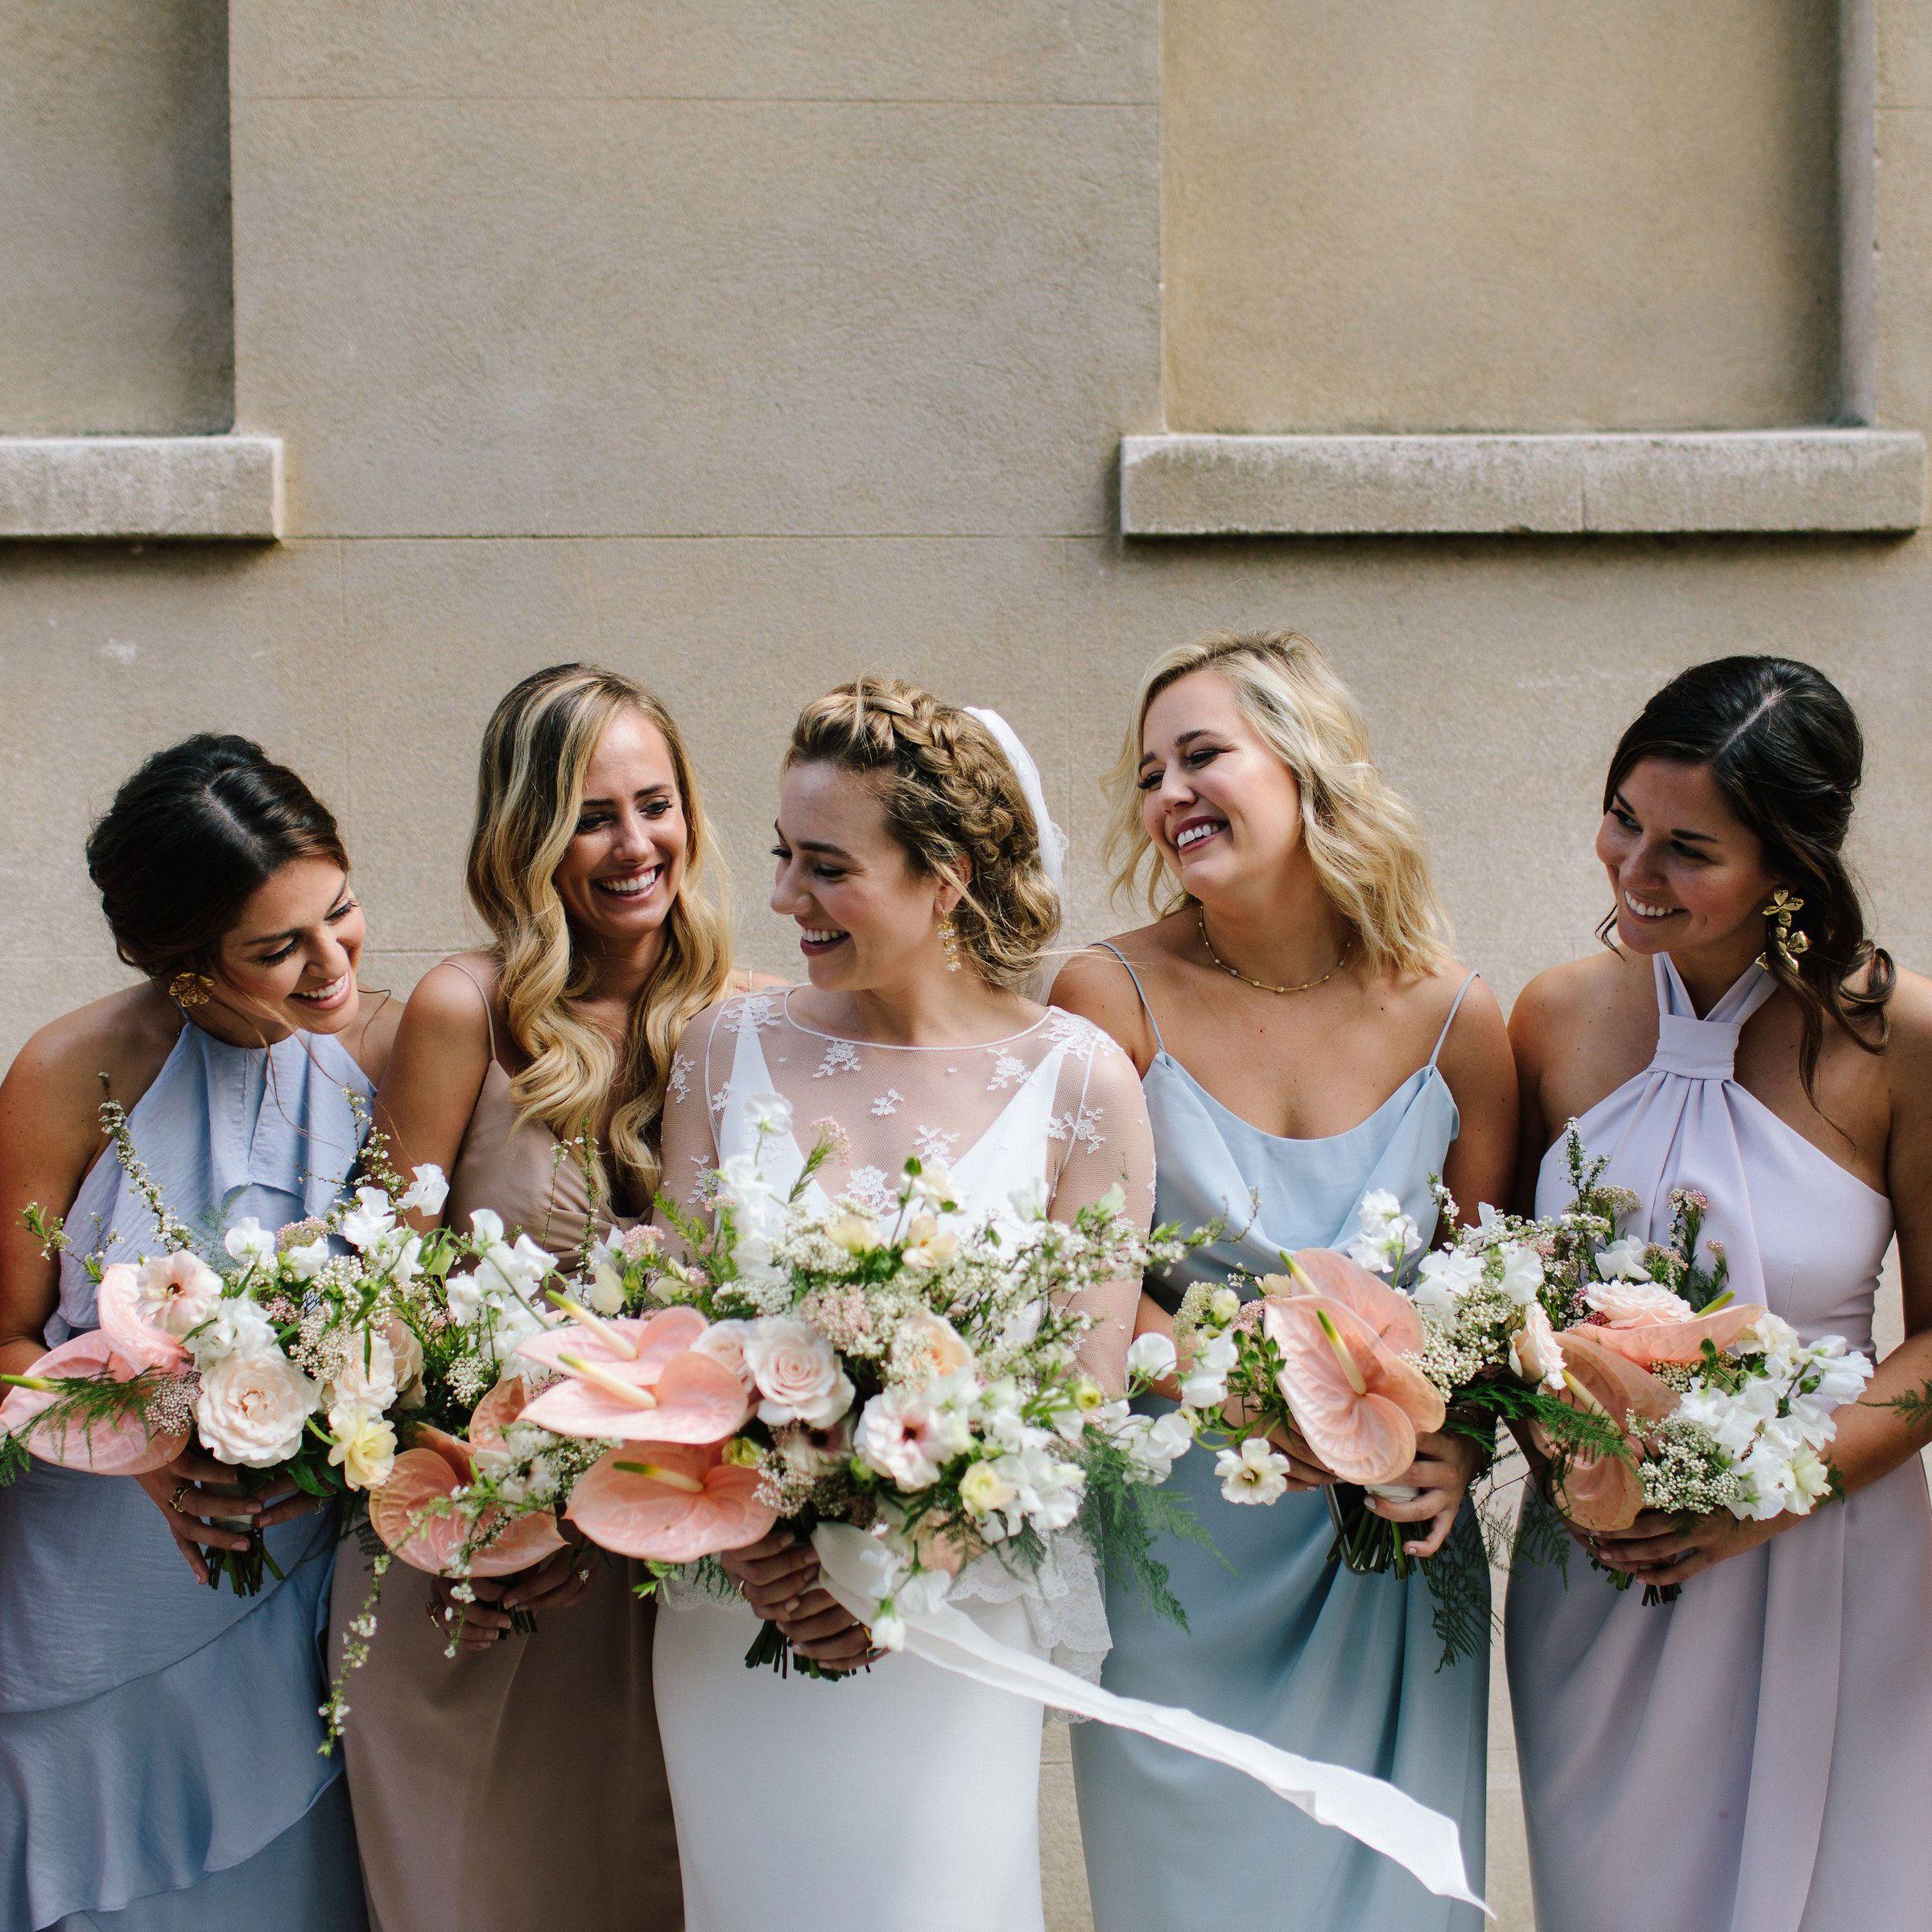 30 Best Pastel Bridesmaid Dresses Of 2021